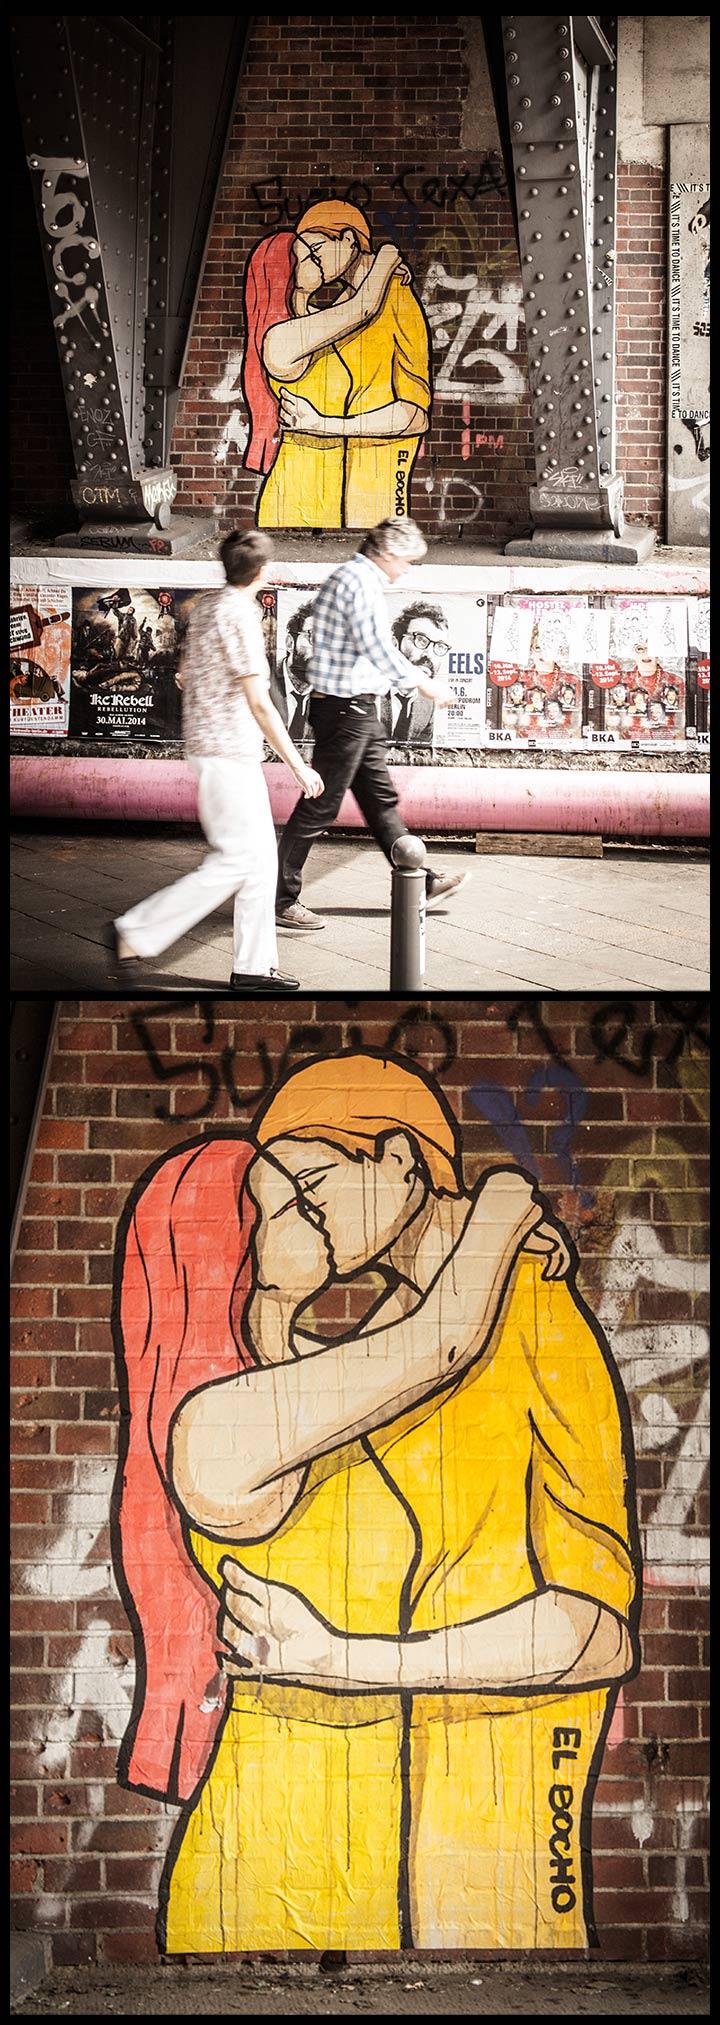 El-bocho-streetart-6